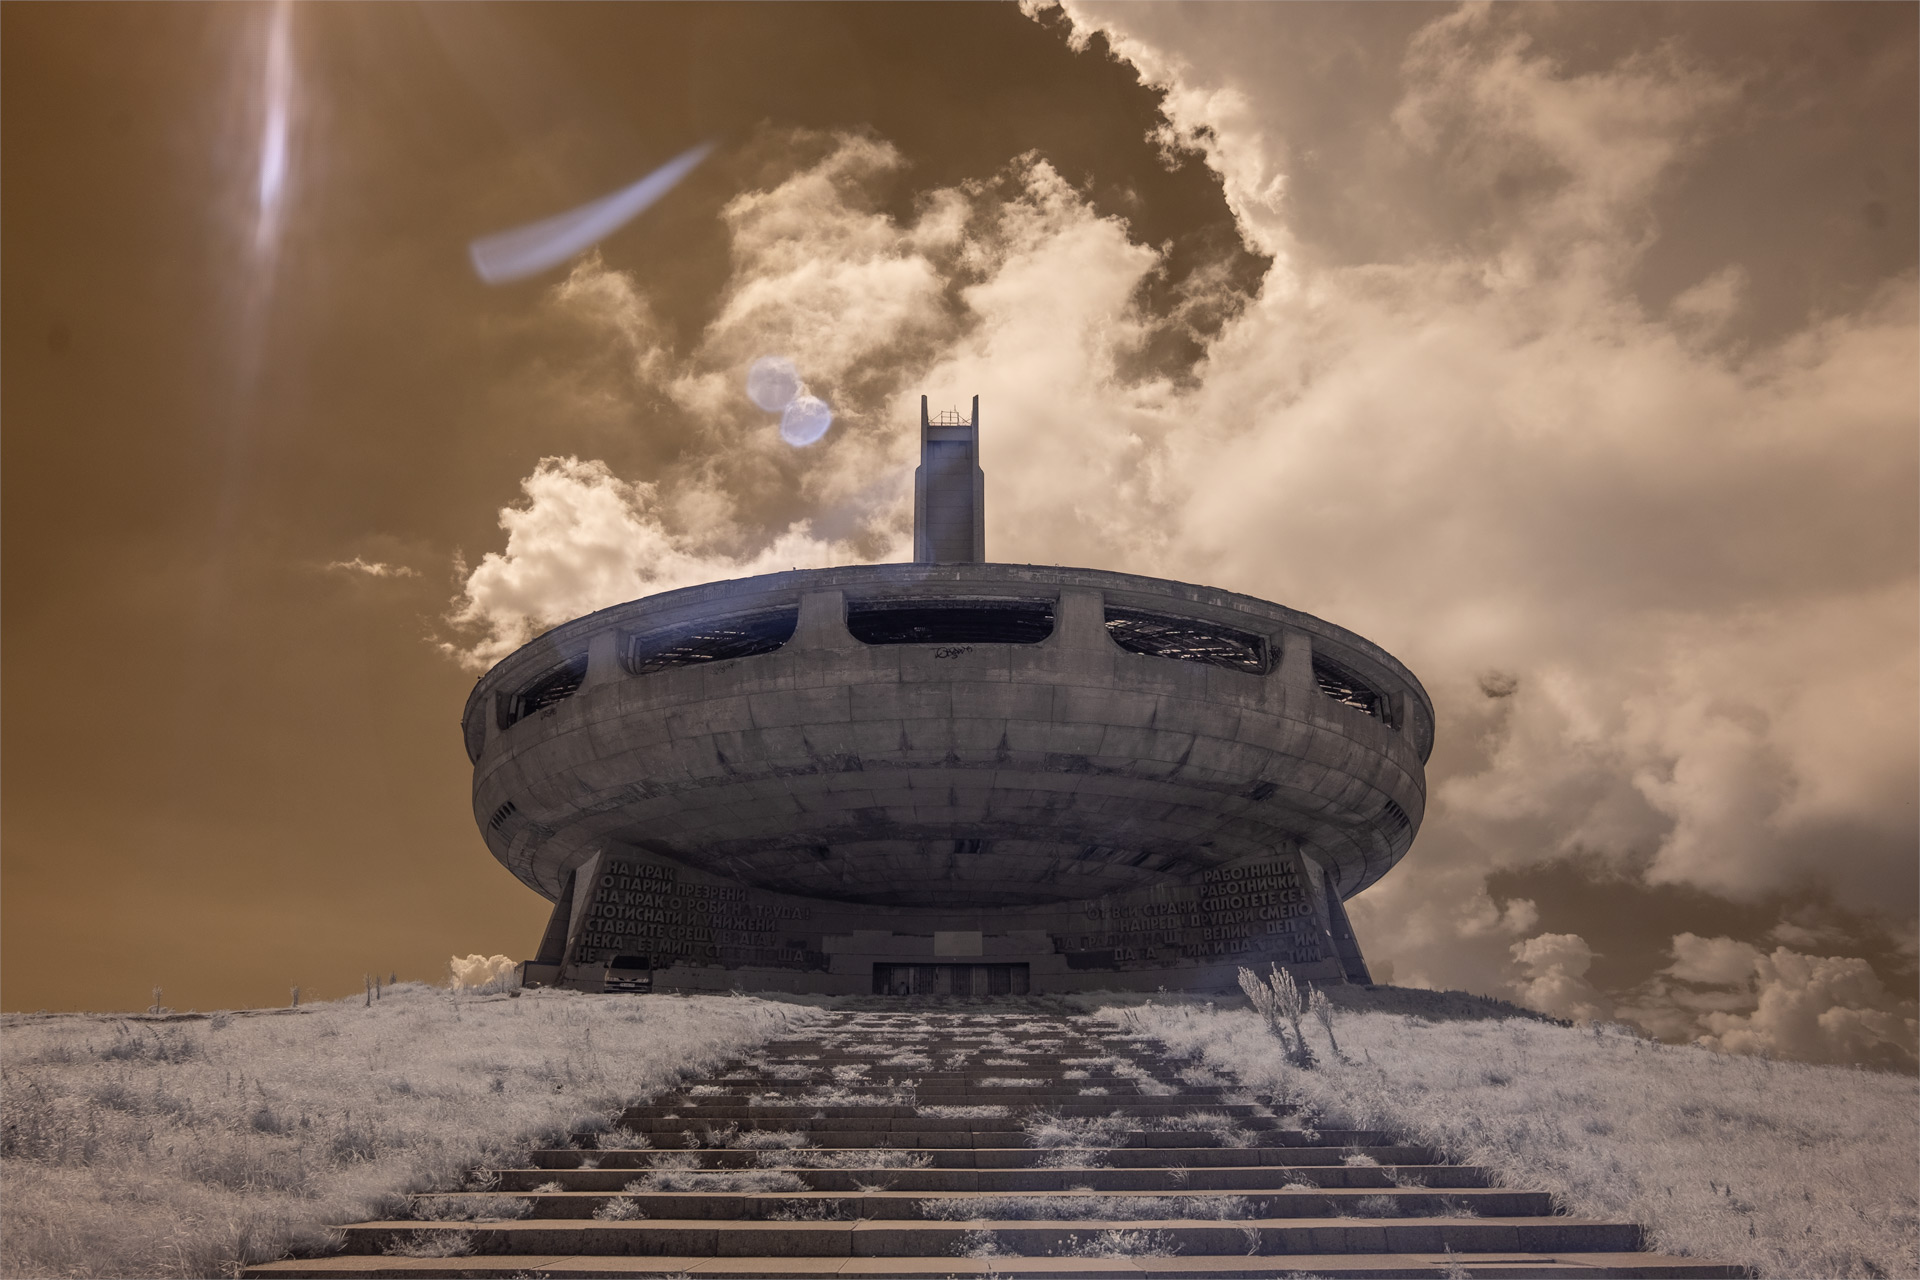 Buzludzha Monument, Bulgaria (IR) (2018) / Show the Original, Landscape Photography, Infrared, Fujinon XF 14mm f/2.8, Fujifilm X-E2, Buzludzha, Bulgaria [buzludzha monument ir 2018 o]